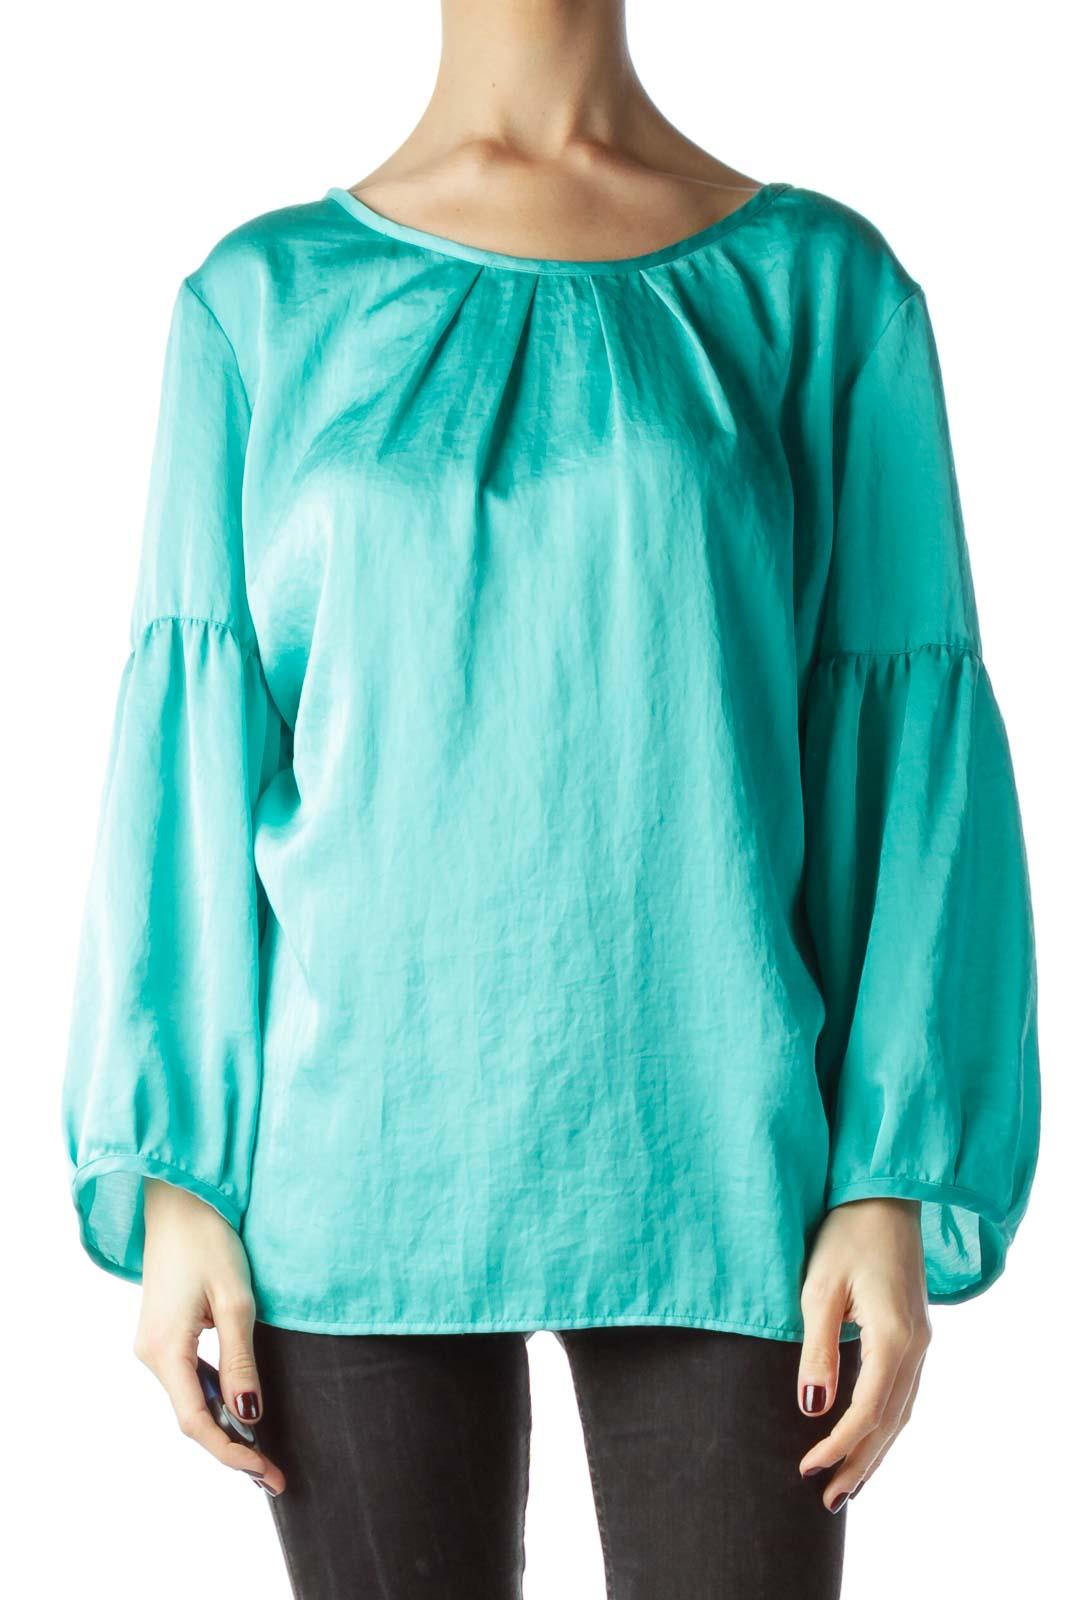 Mint Green Neckline Pleats Shiny Blouse